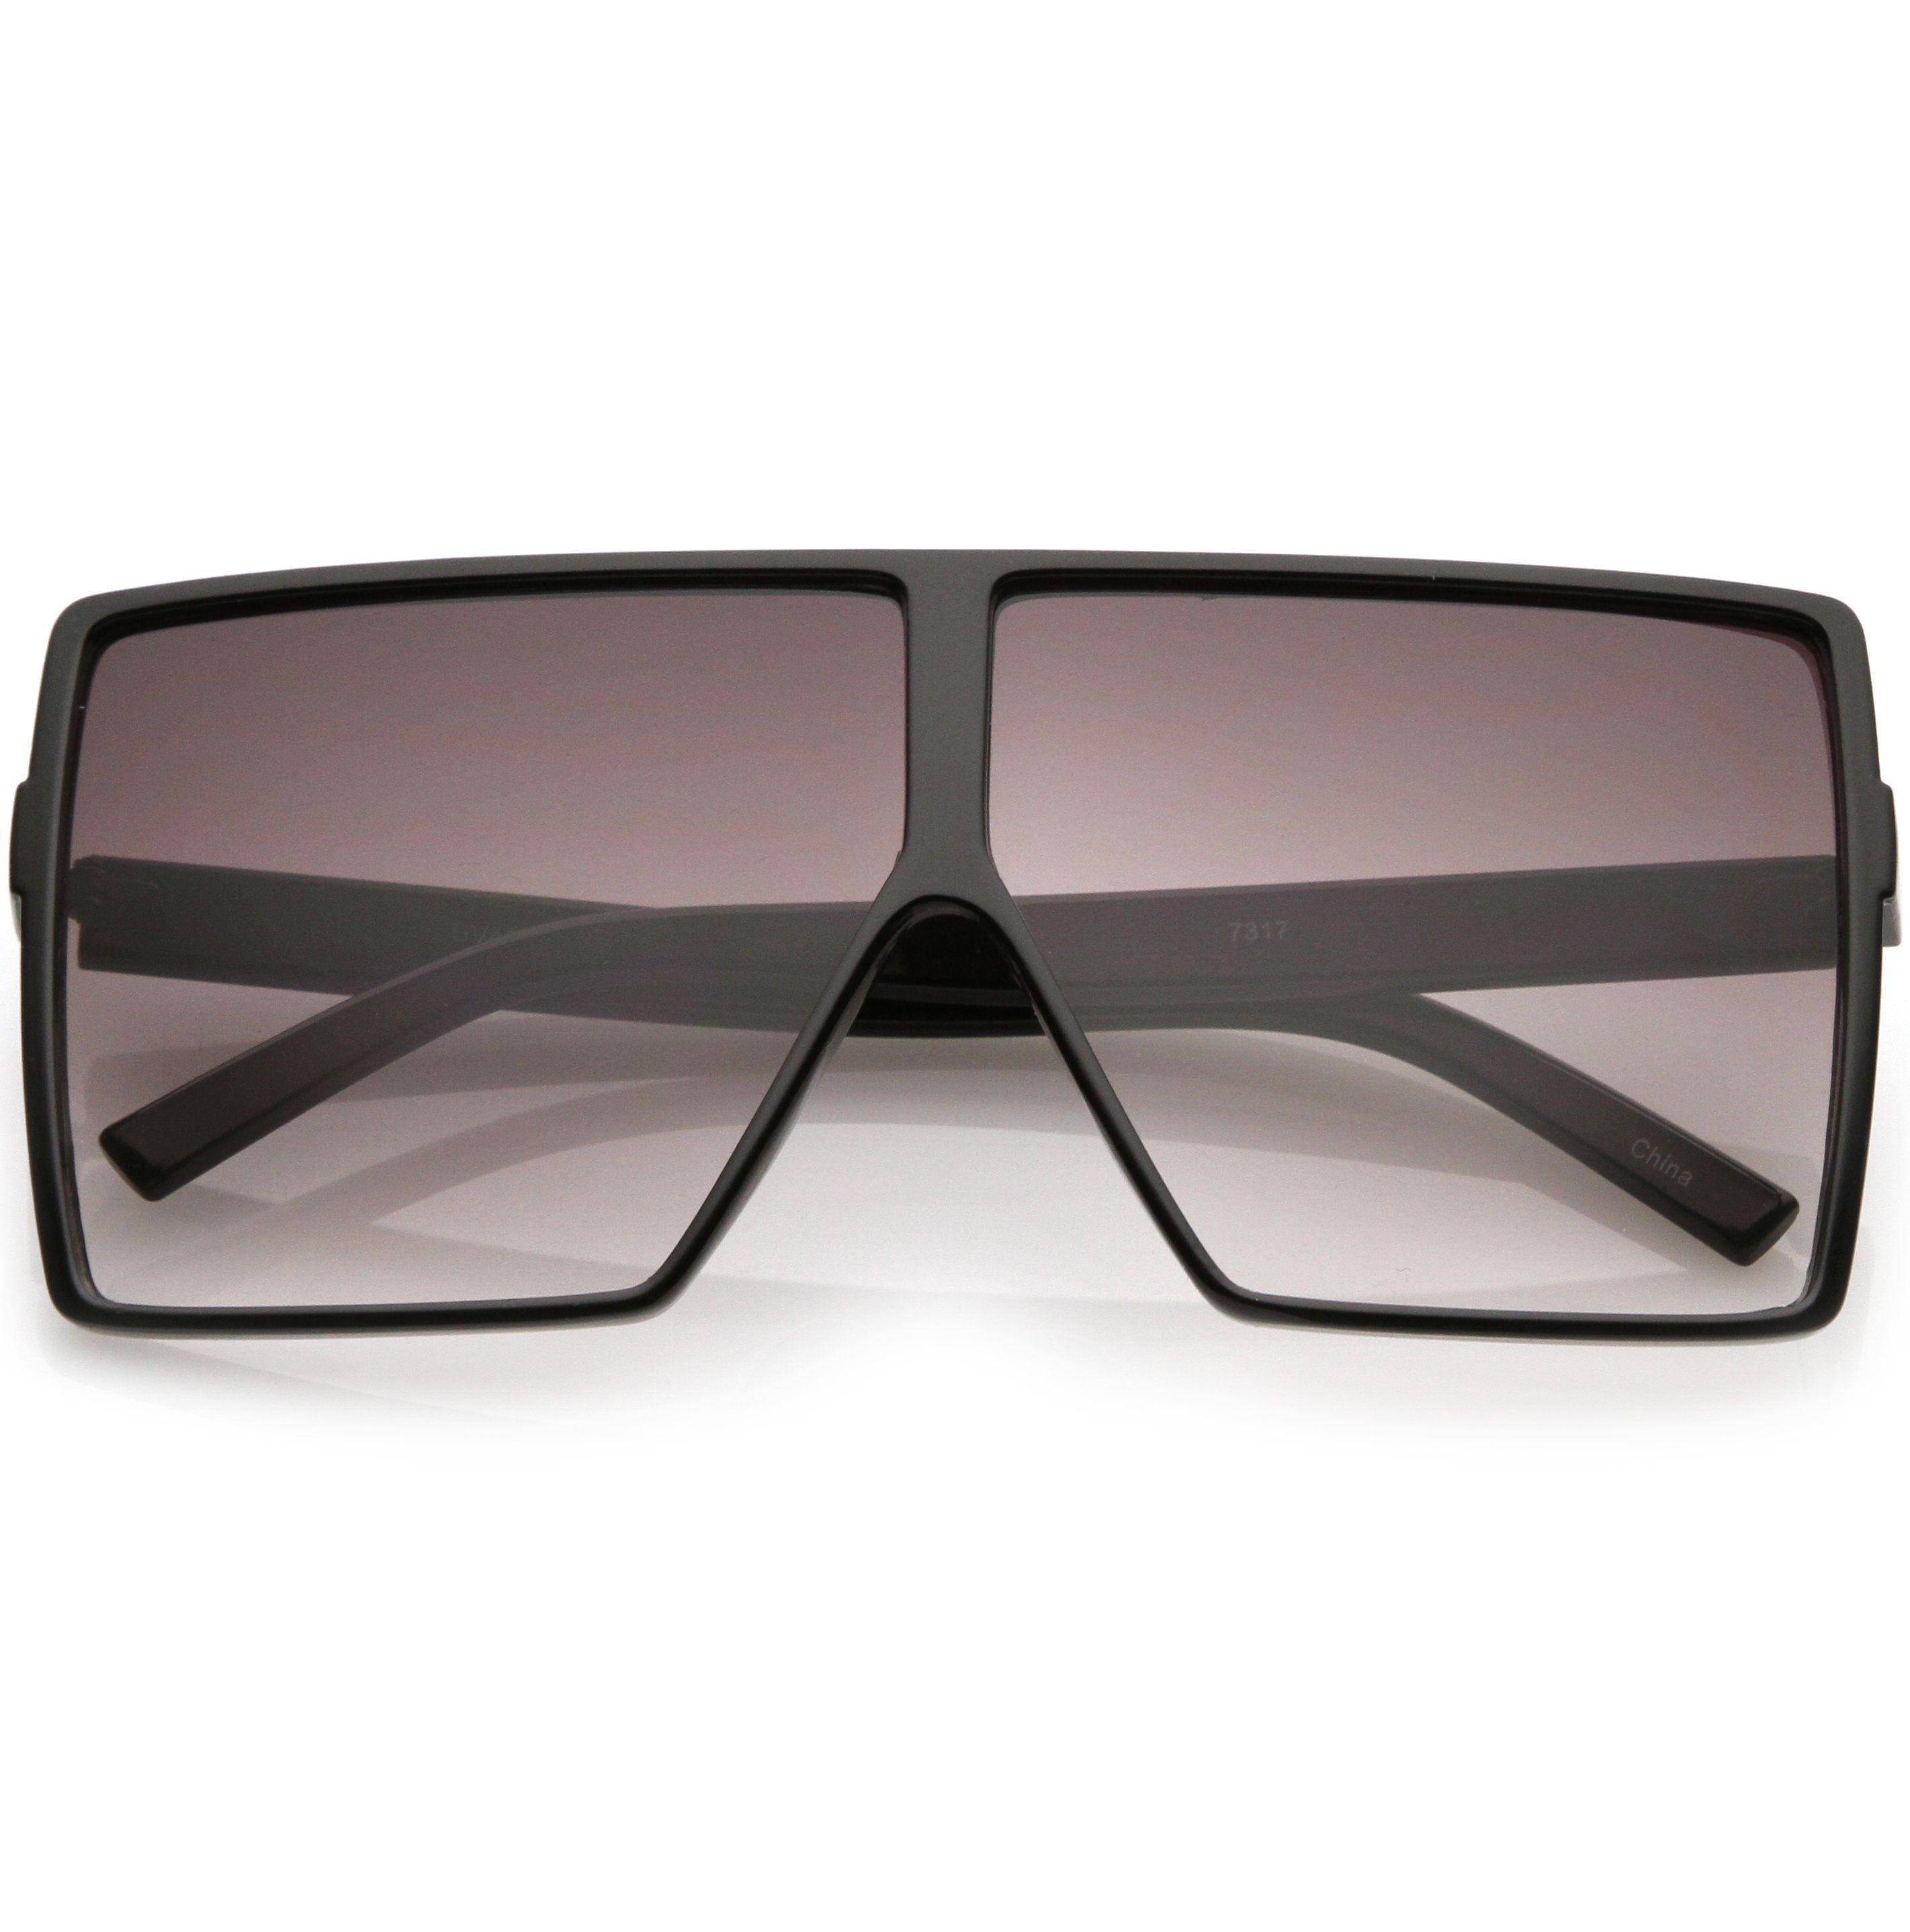 bd4391fb4 Oversize Retro Modern Futuristic Square Aviator Sunglasses C475 ...